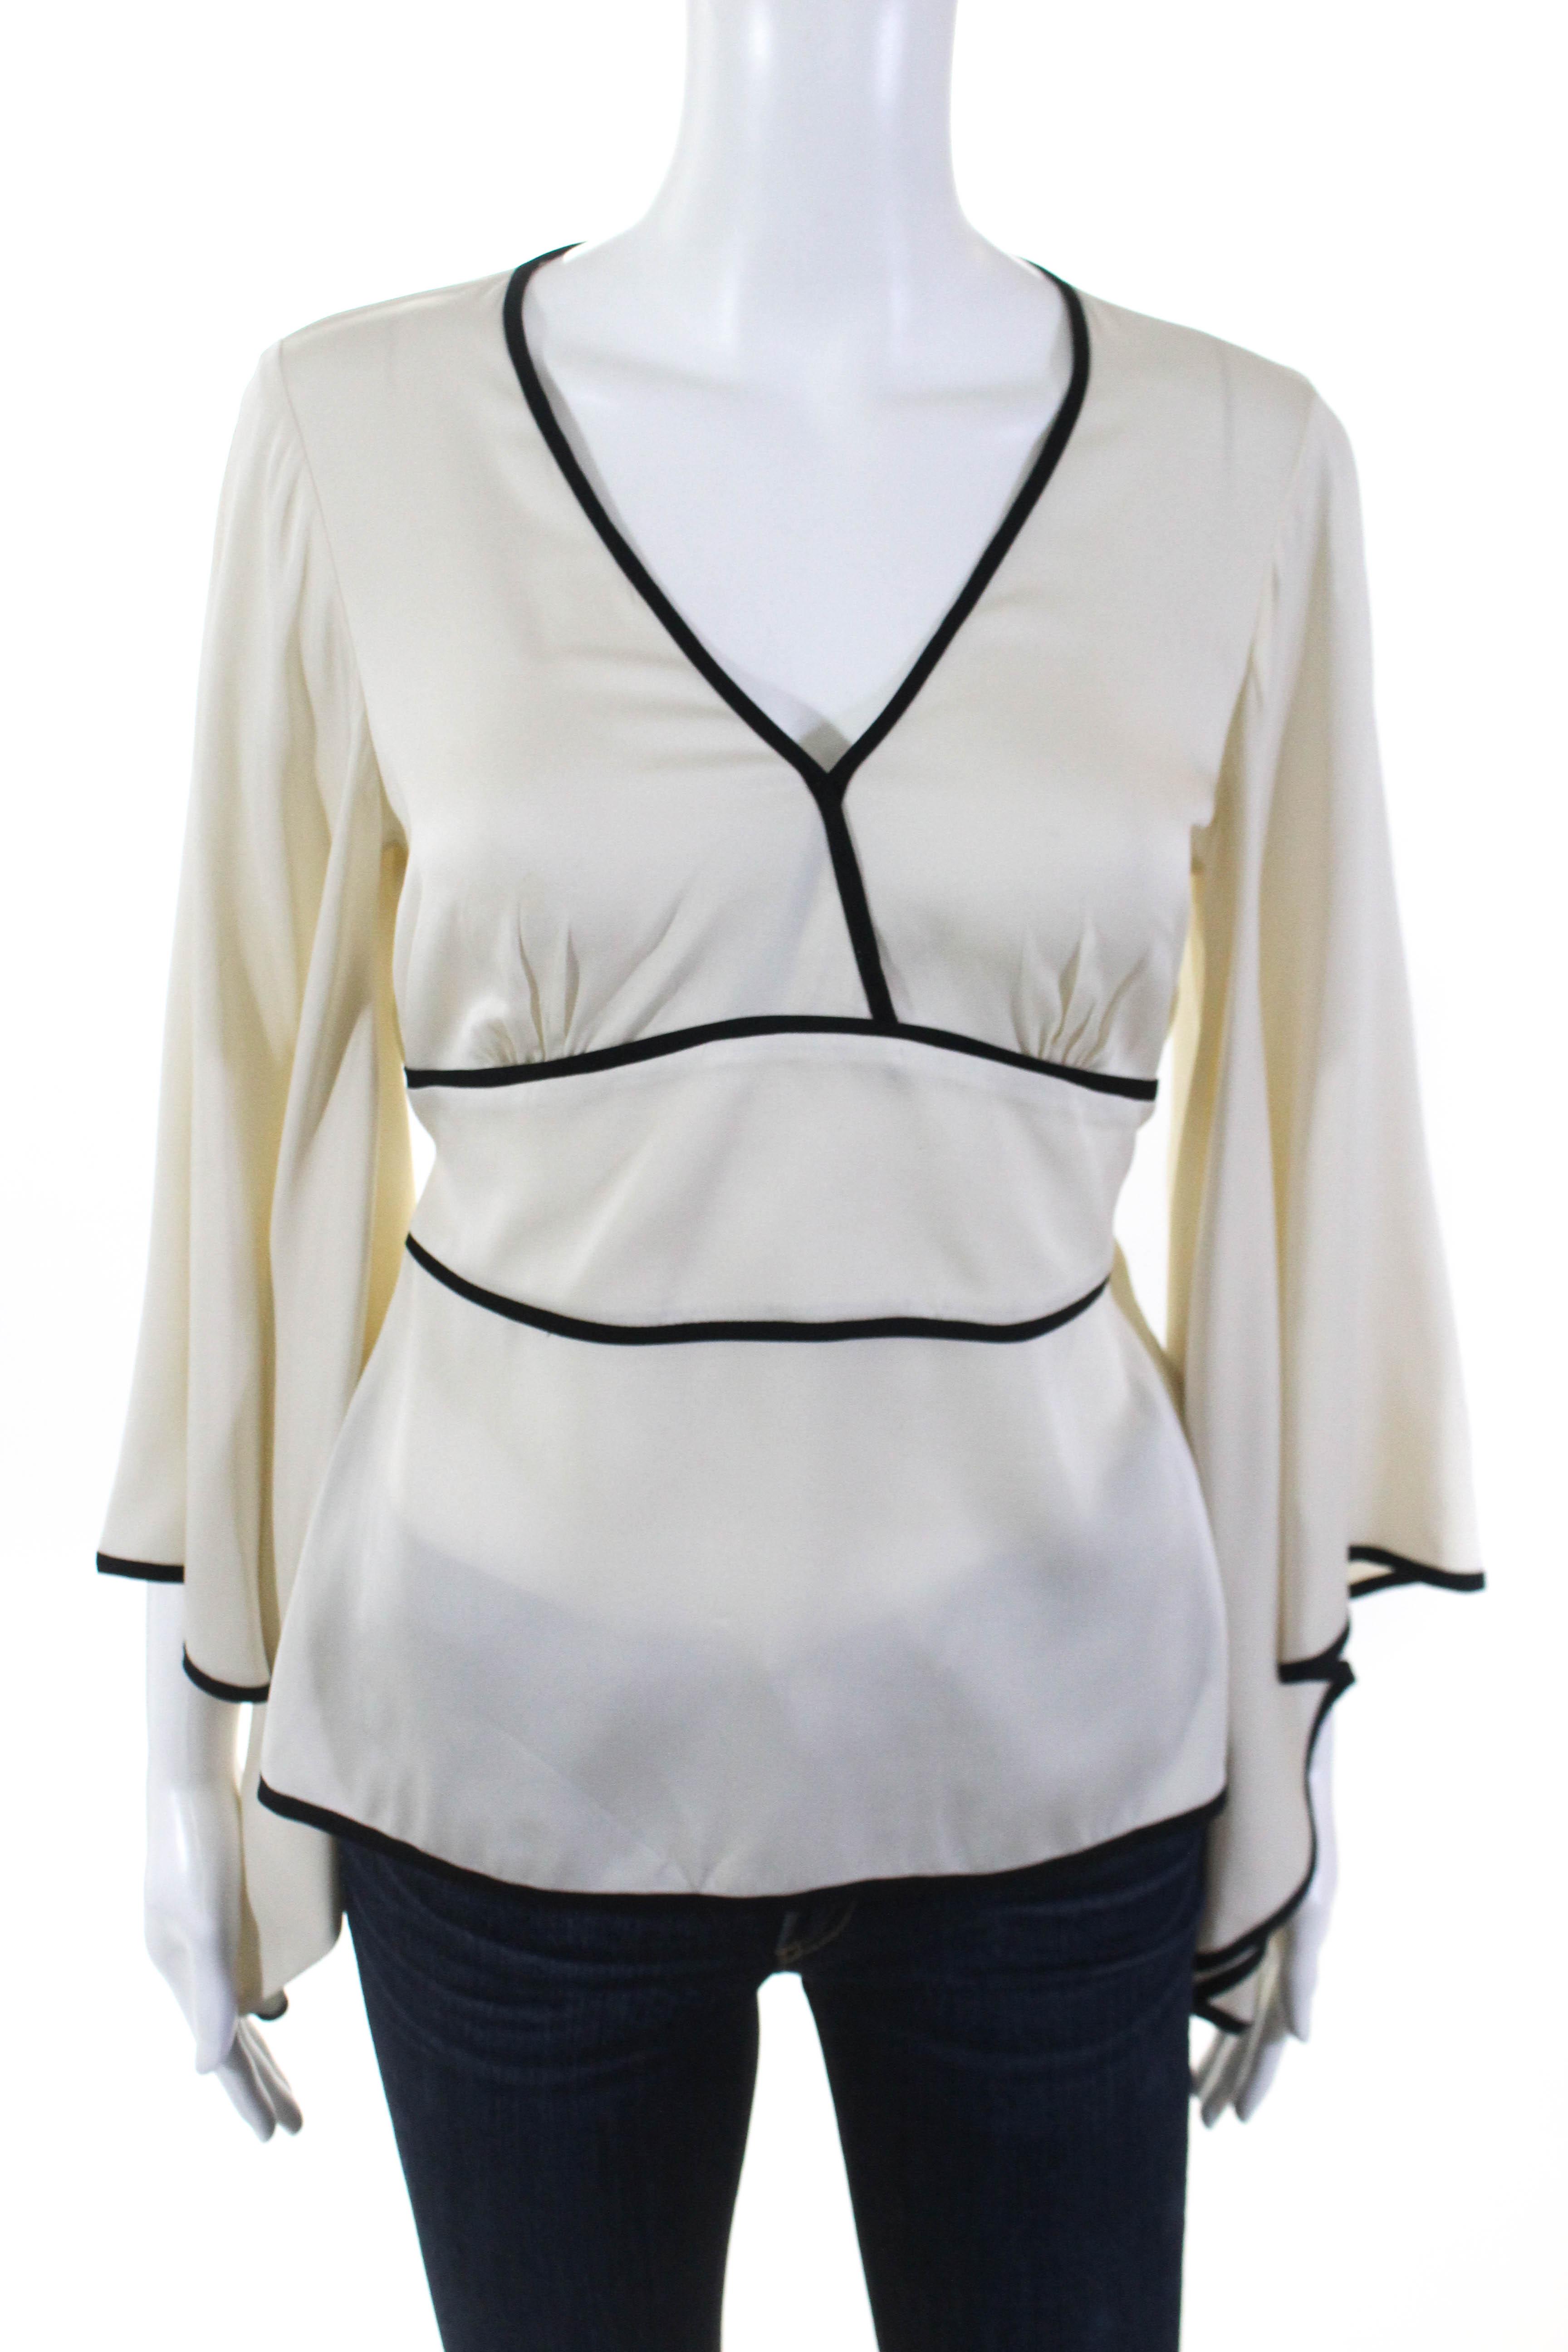 e4cd30cc9e2cc1 Trina Turk Womens Silk V Neck Bell Sleeves Blouse Ivory Black Size Medium